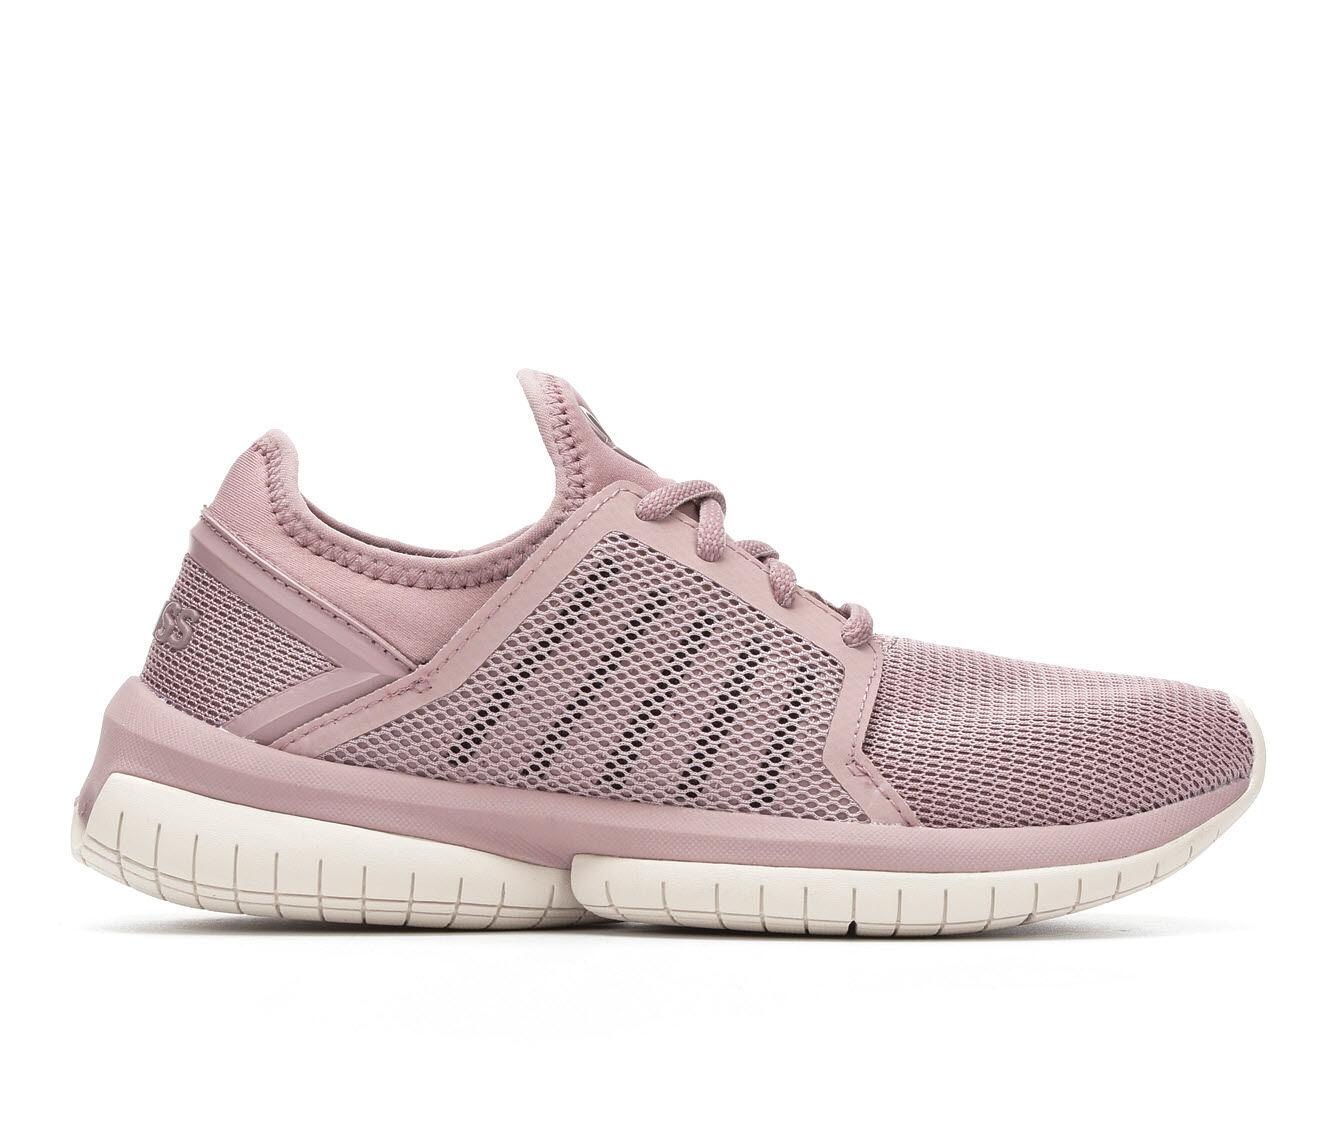 Women's K-Swiss Tubes Millenia Running Shoes